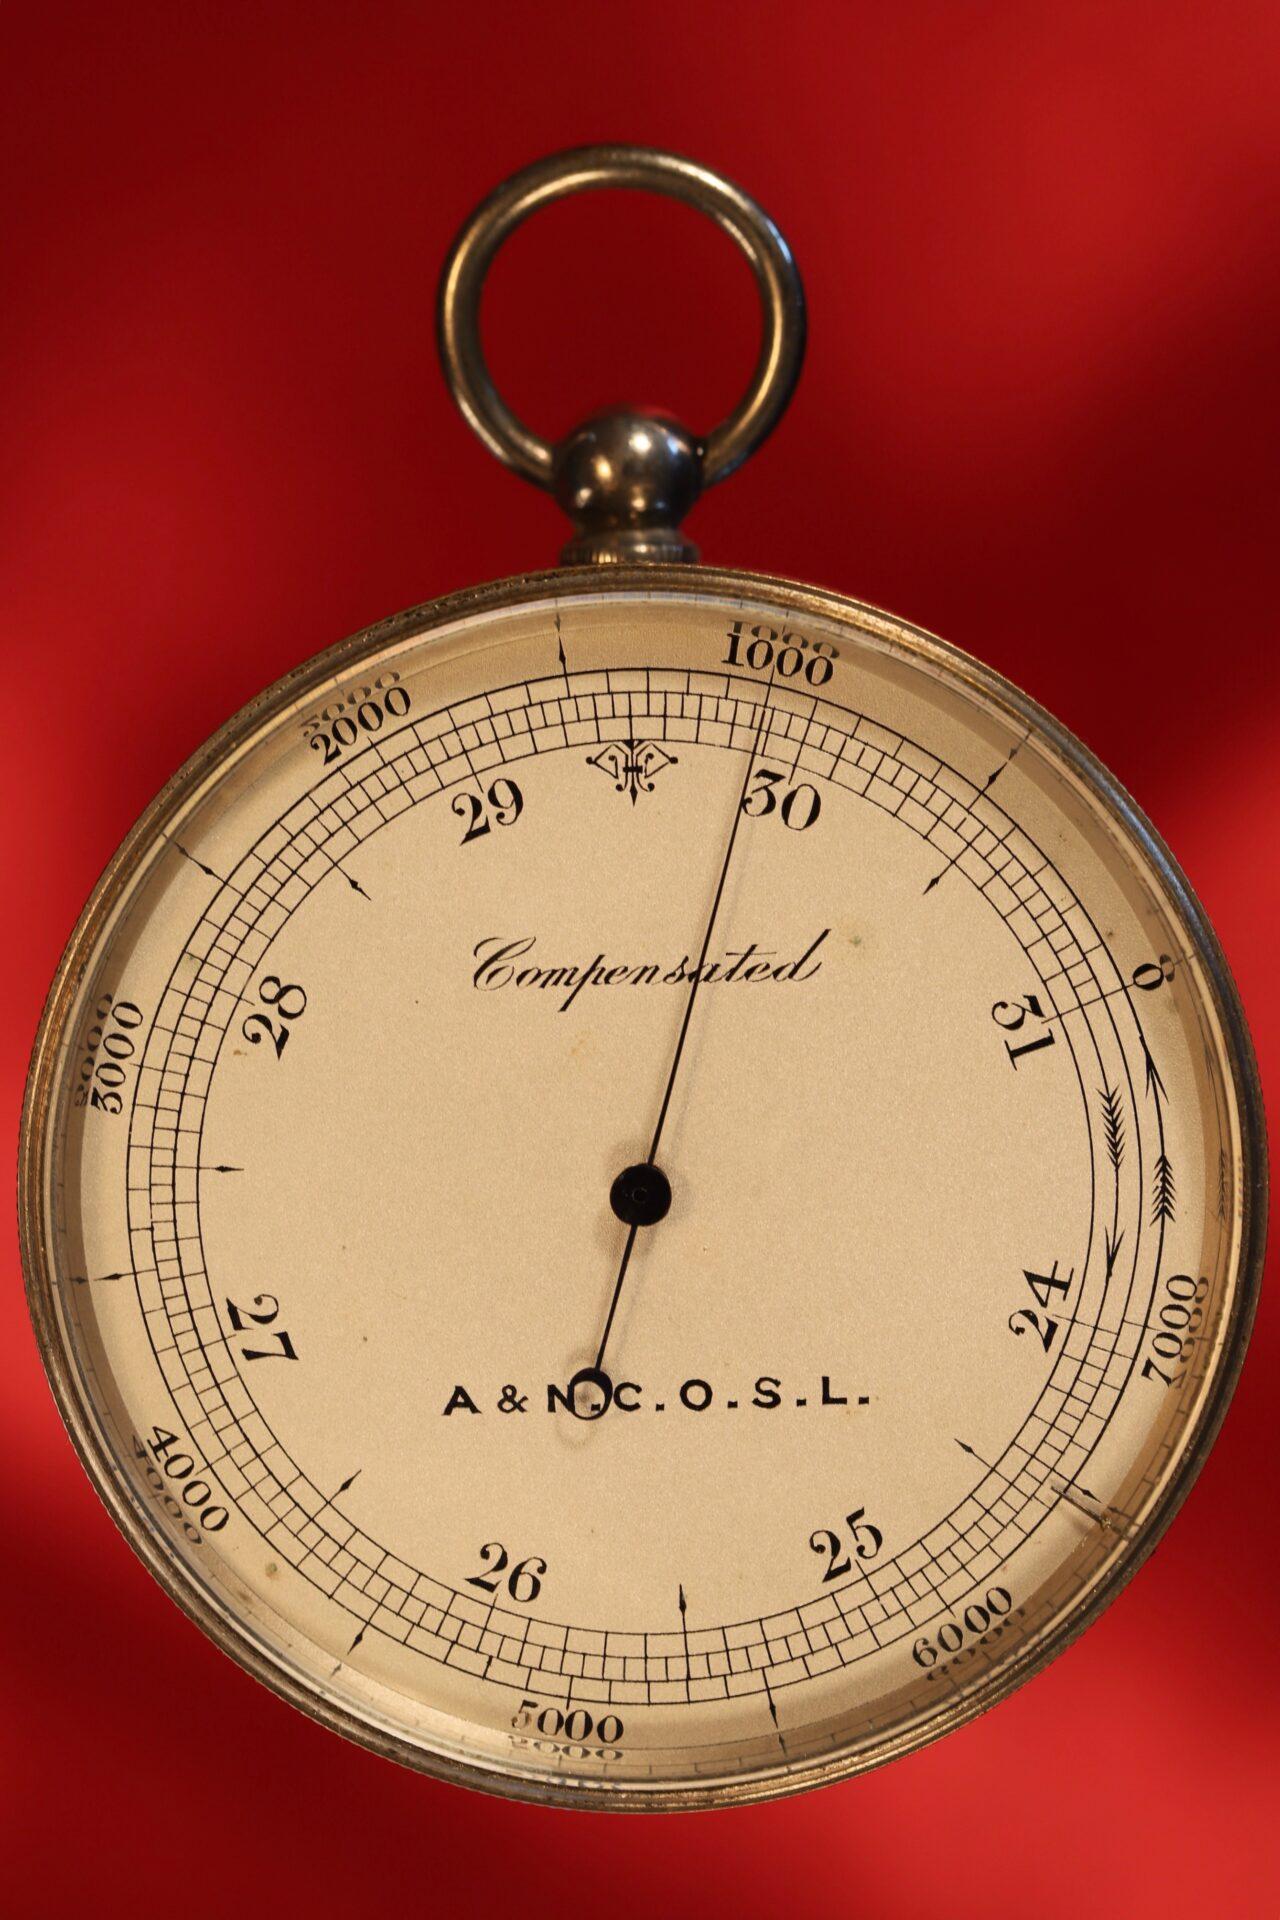 Image of Army & Navy COSL Pocket Barometer Compendium c1880 showing pocket barometer